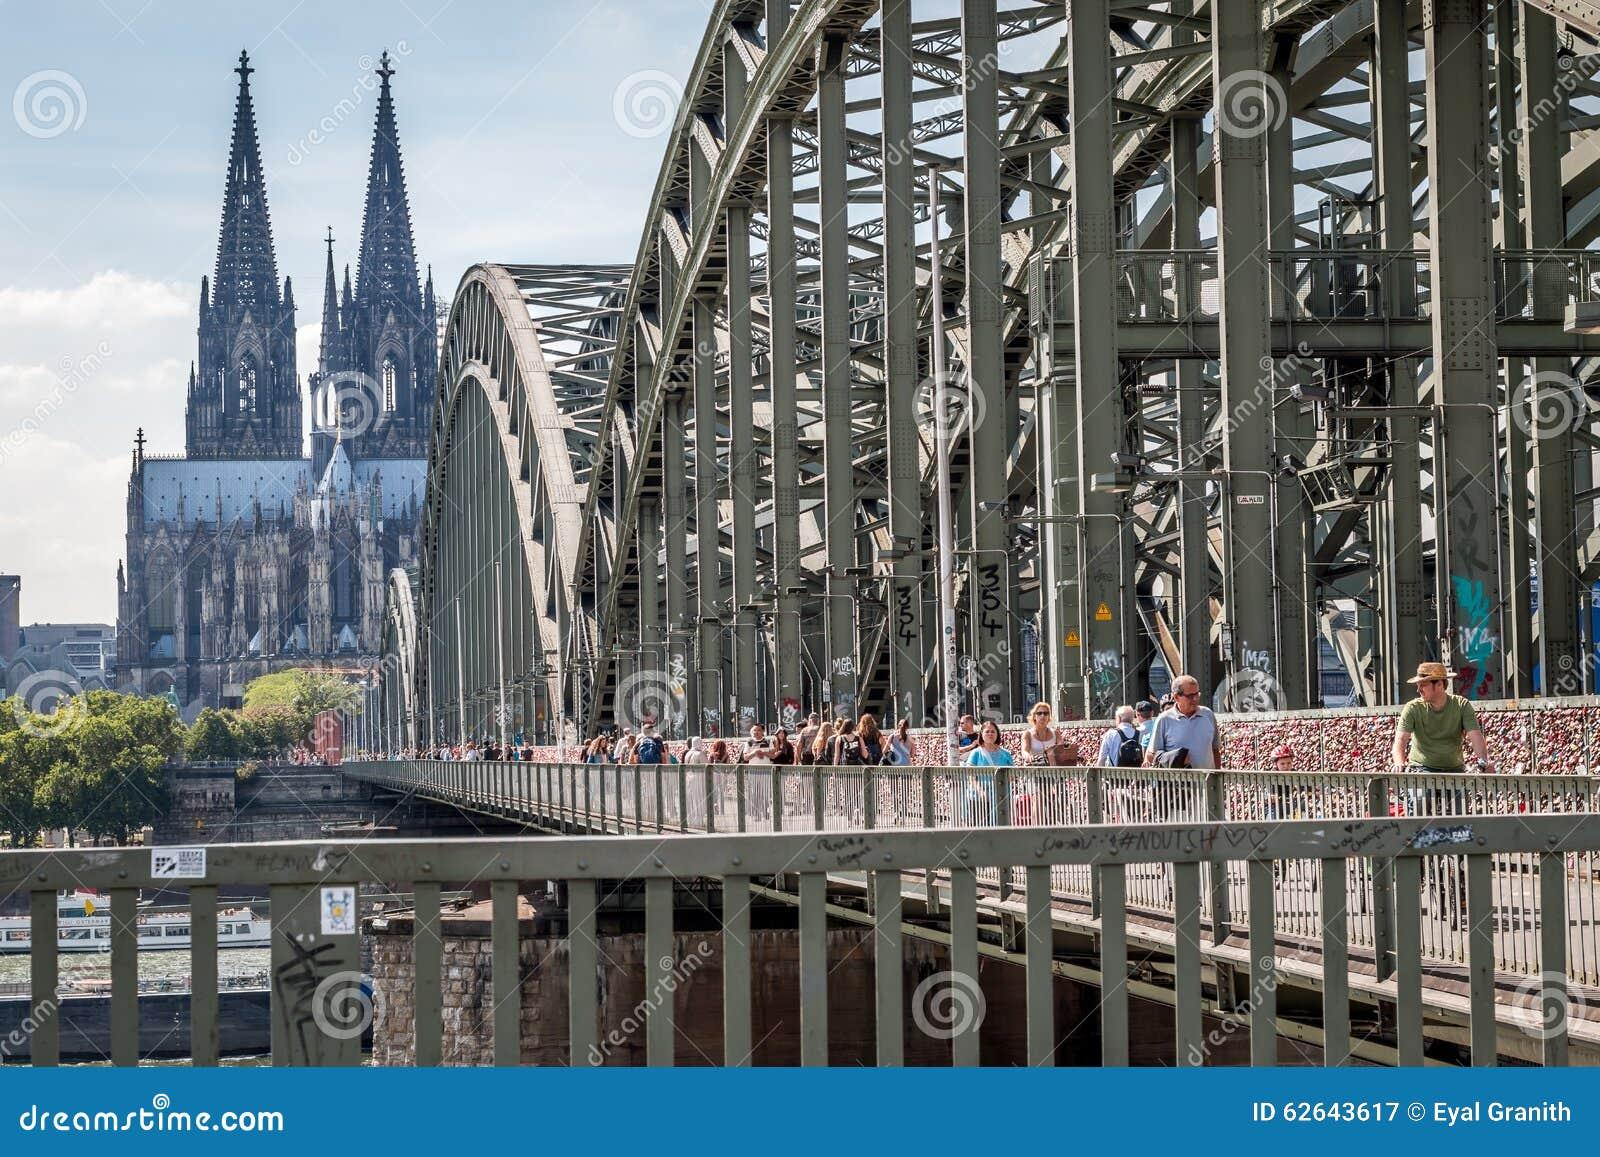 KÖLN, DEUTSCHLAND - 31. JULI 2015: Berühmte Hohenzollern-Brücke